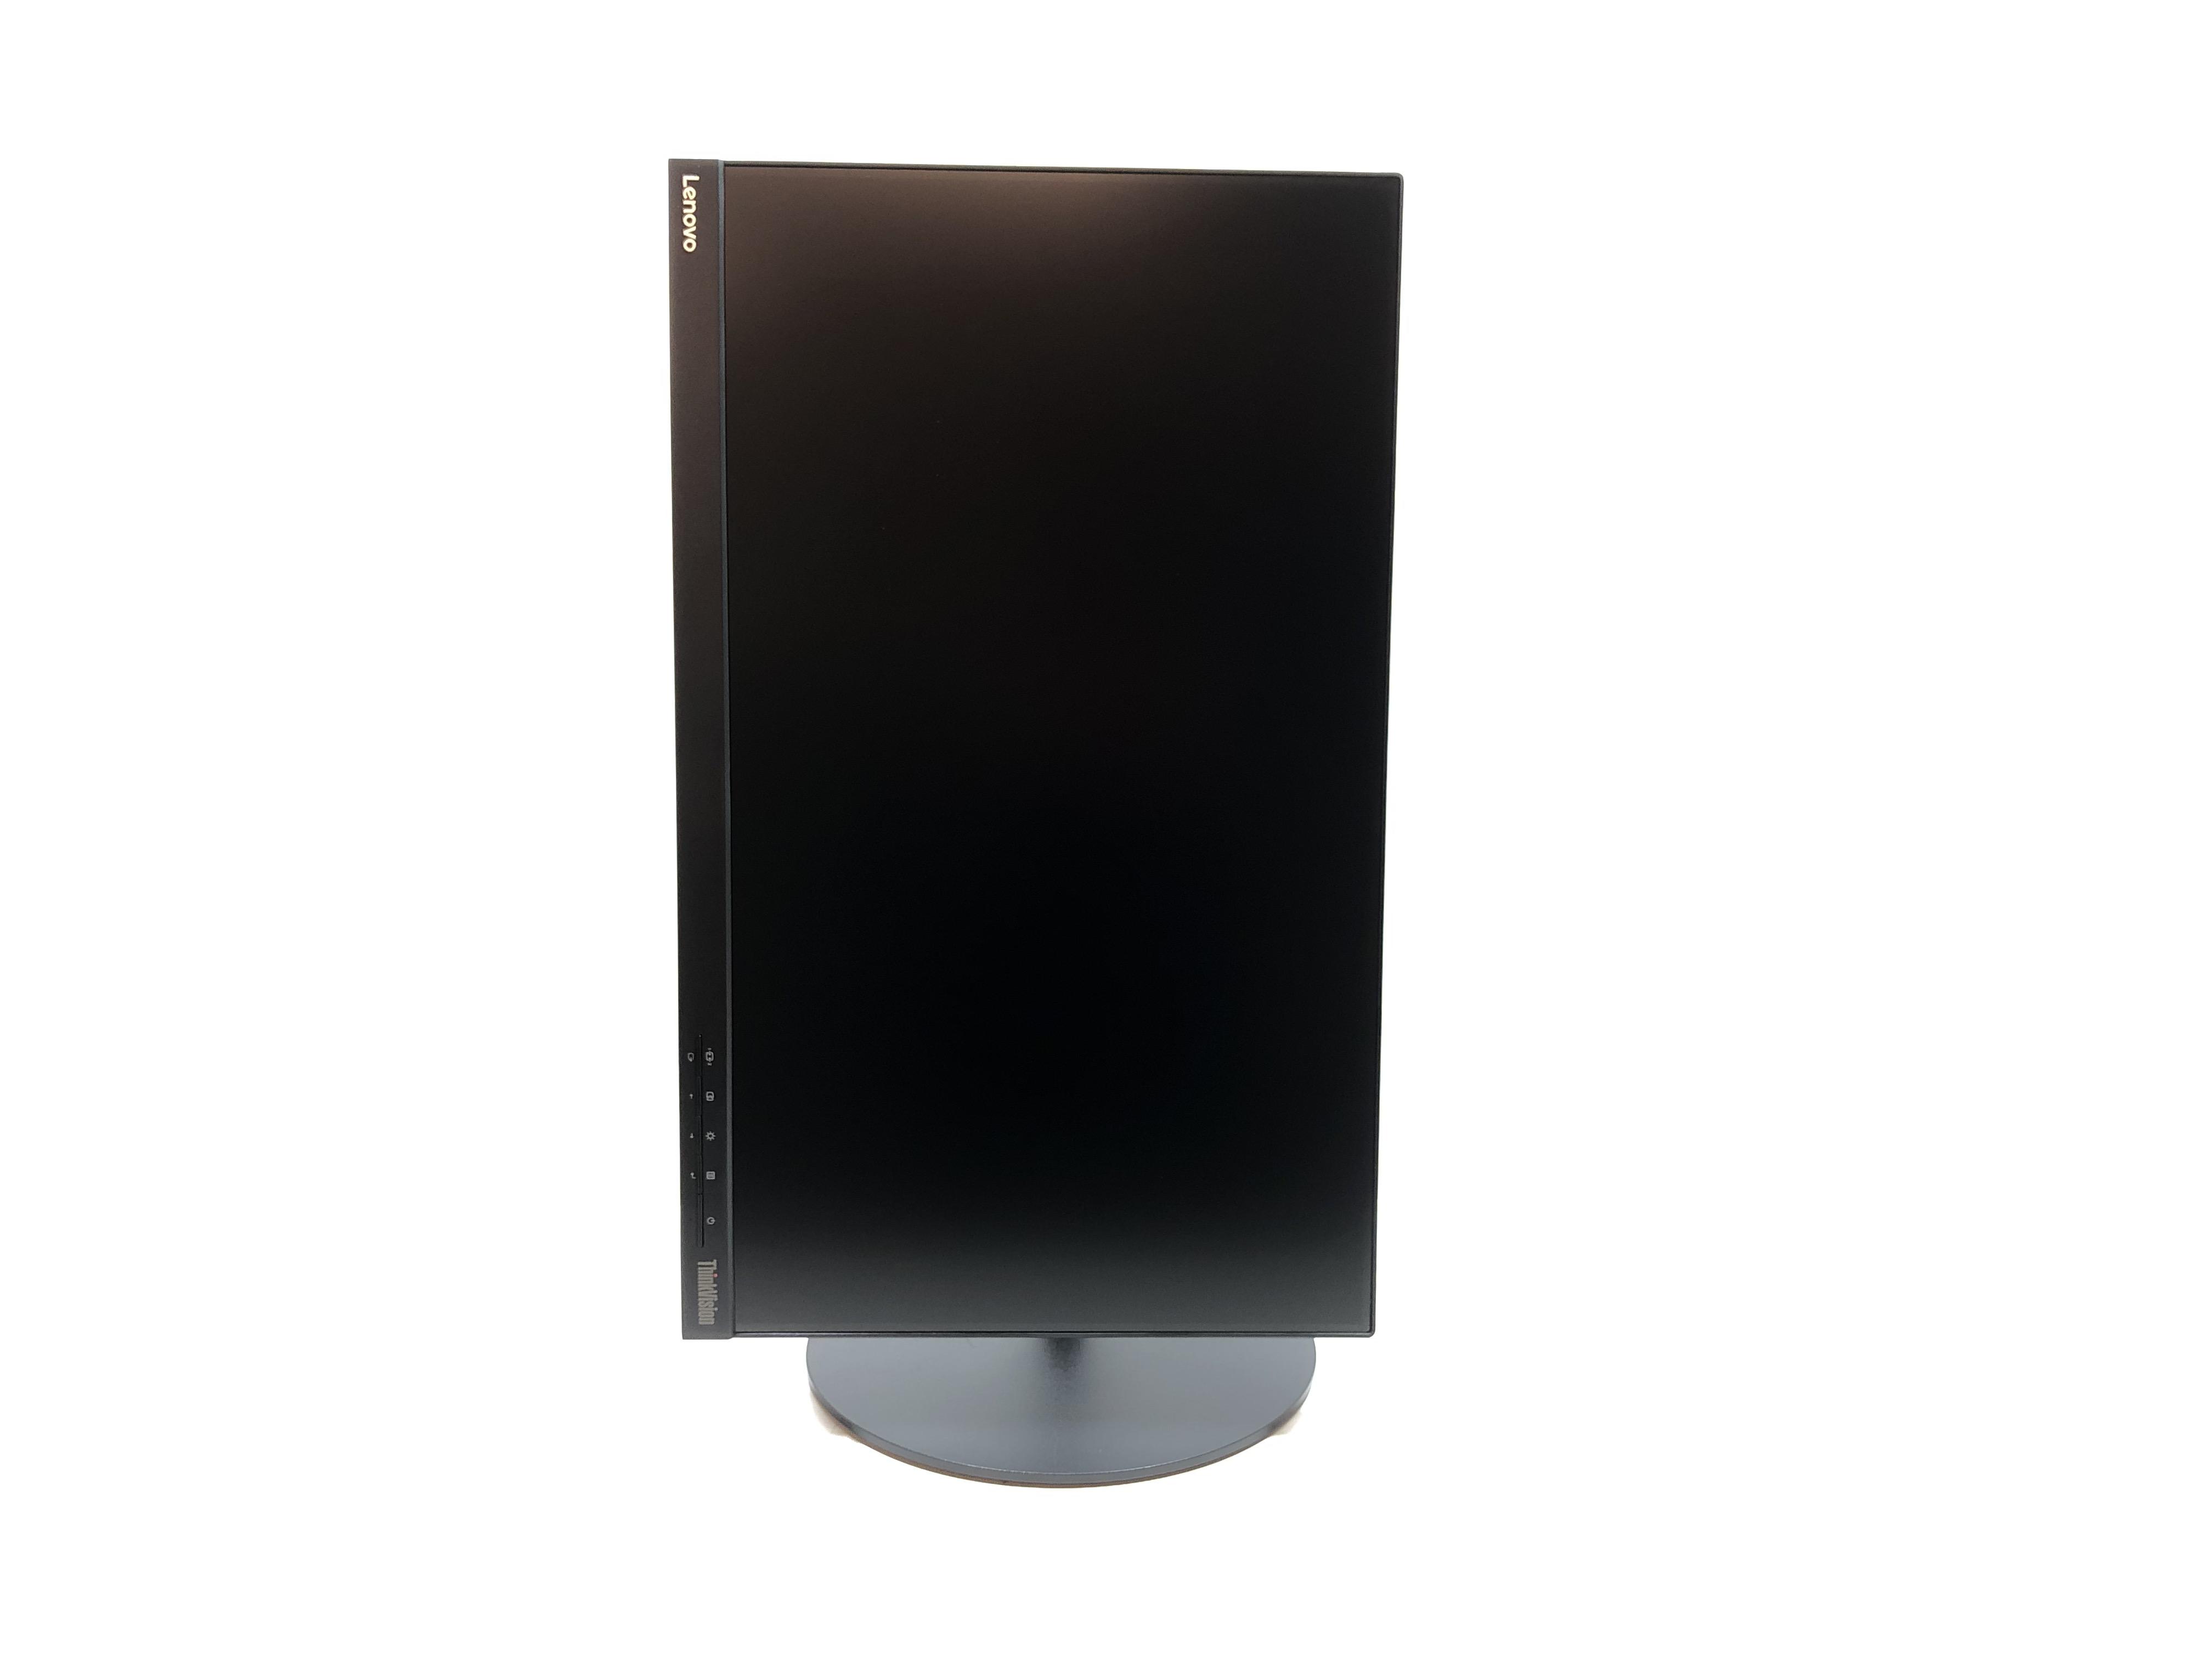 Lenovo ThinkVision T23i-10 No 5